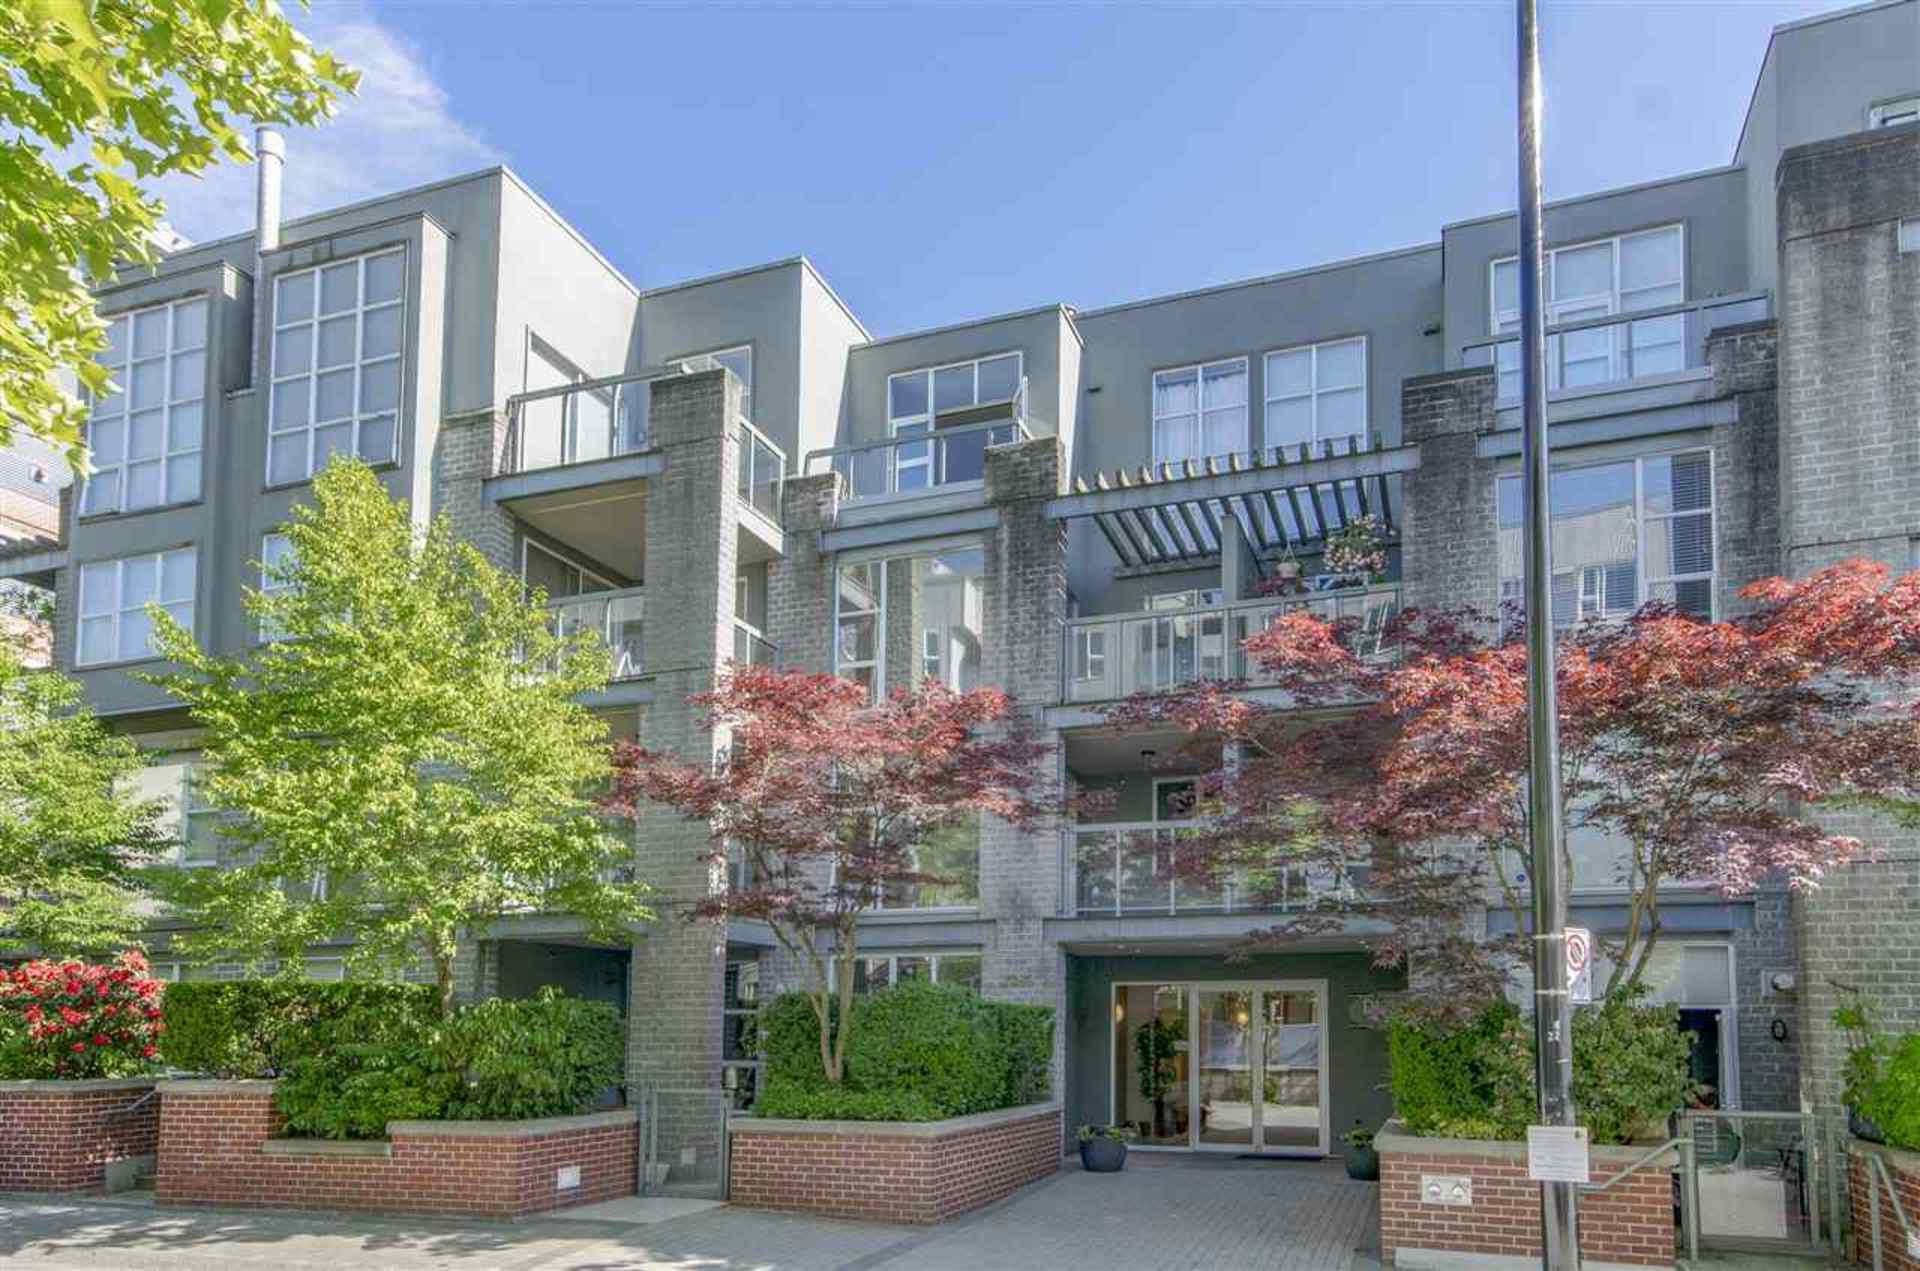 2288-marstrand-avenue-kitsilano-vancouver-west-01 at 111 - 2288 Marstrand Avenue, Kitsilano, Vancouver West